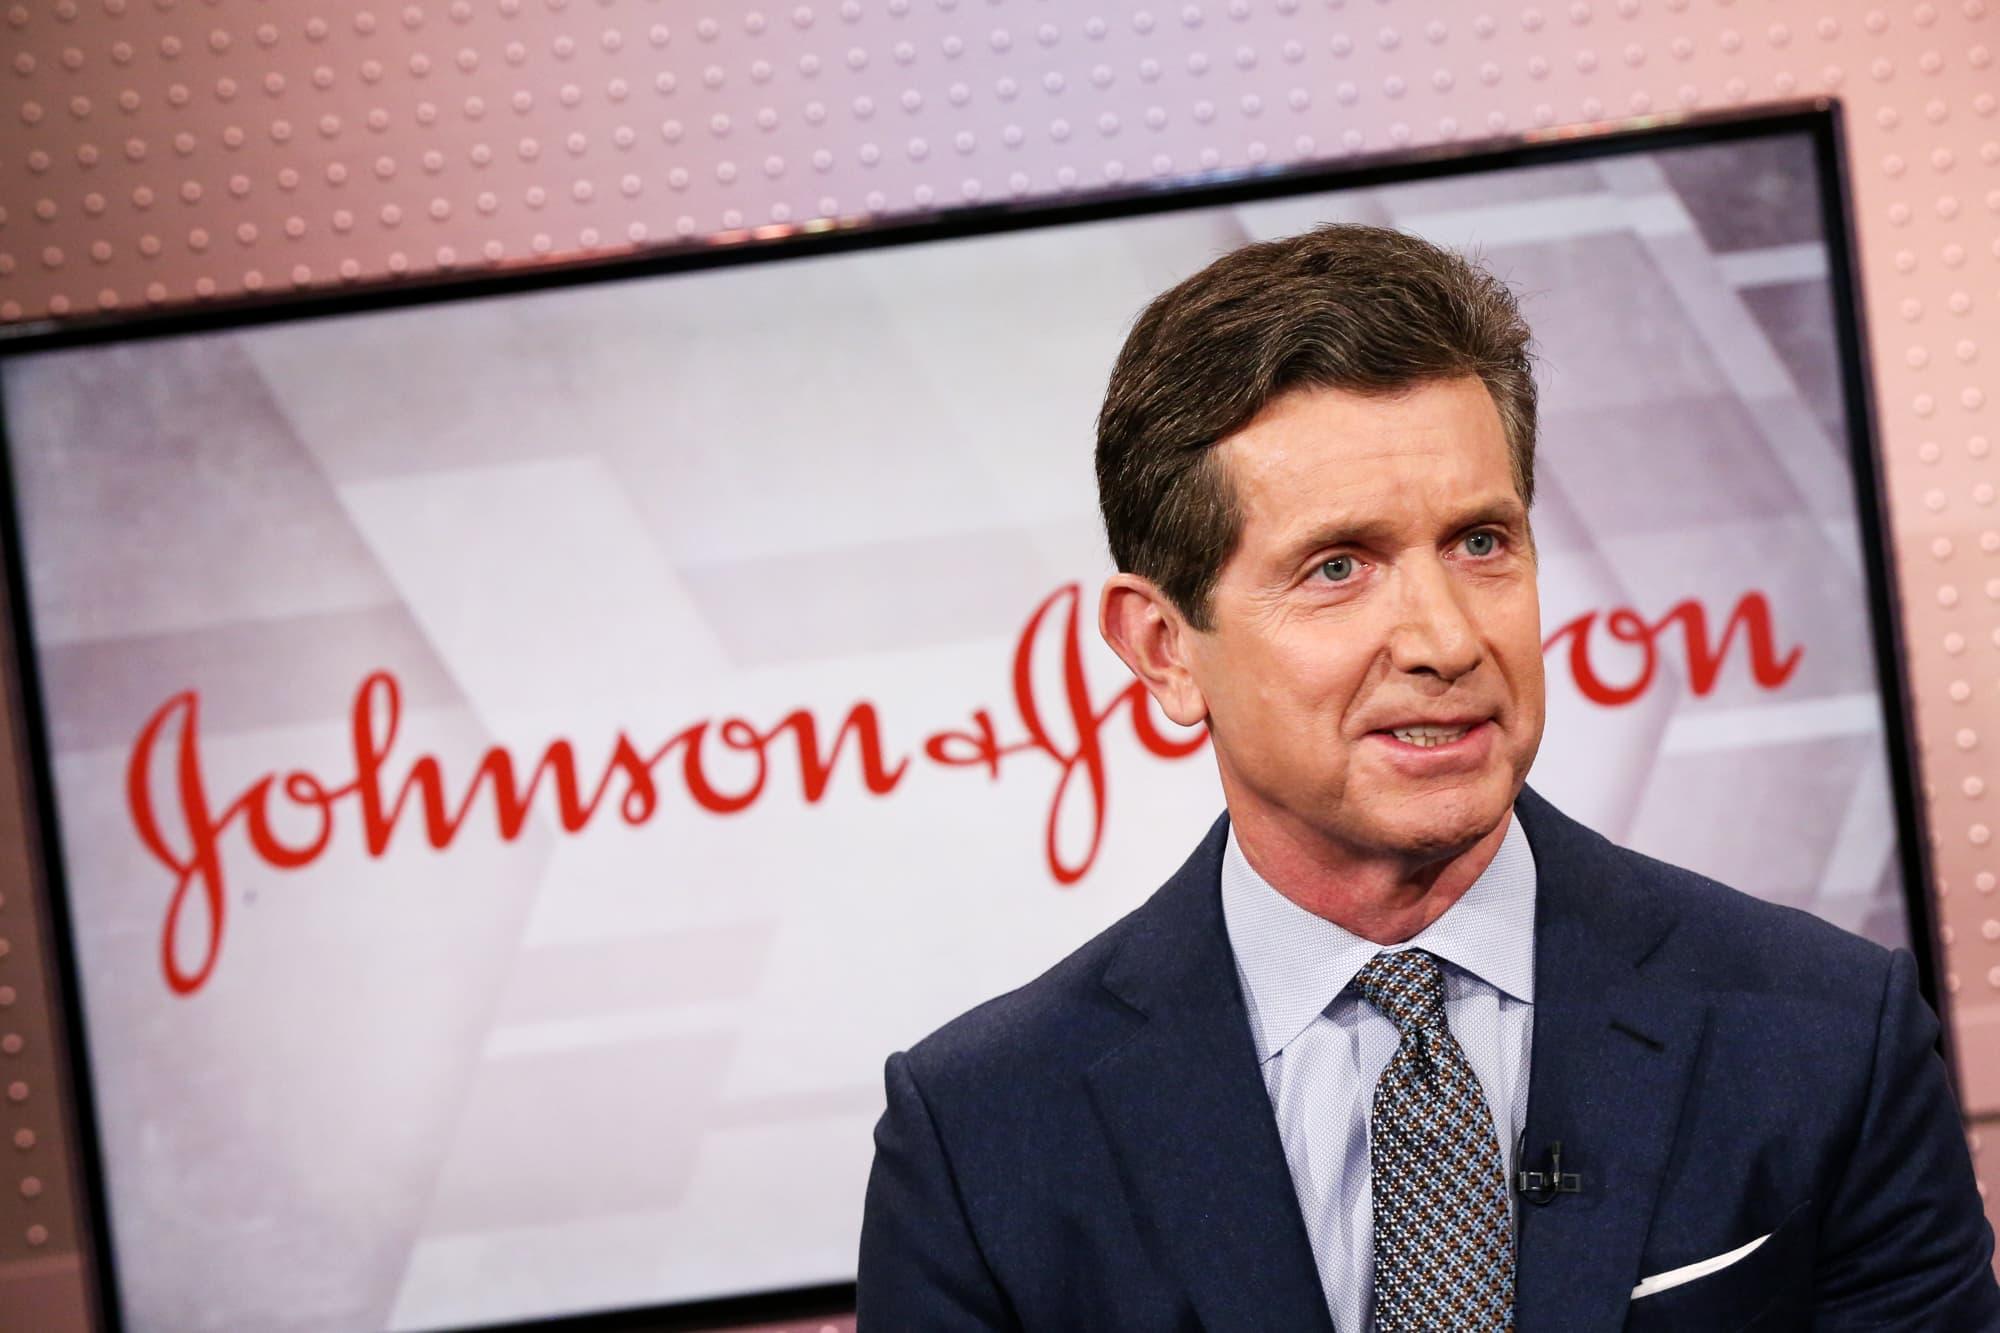 CNBC: Alex Gorsky, CEO of Johnson & Johnson MM 190215 1